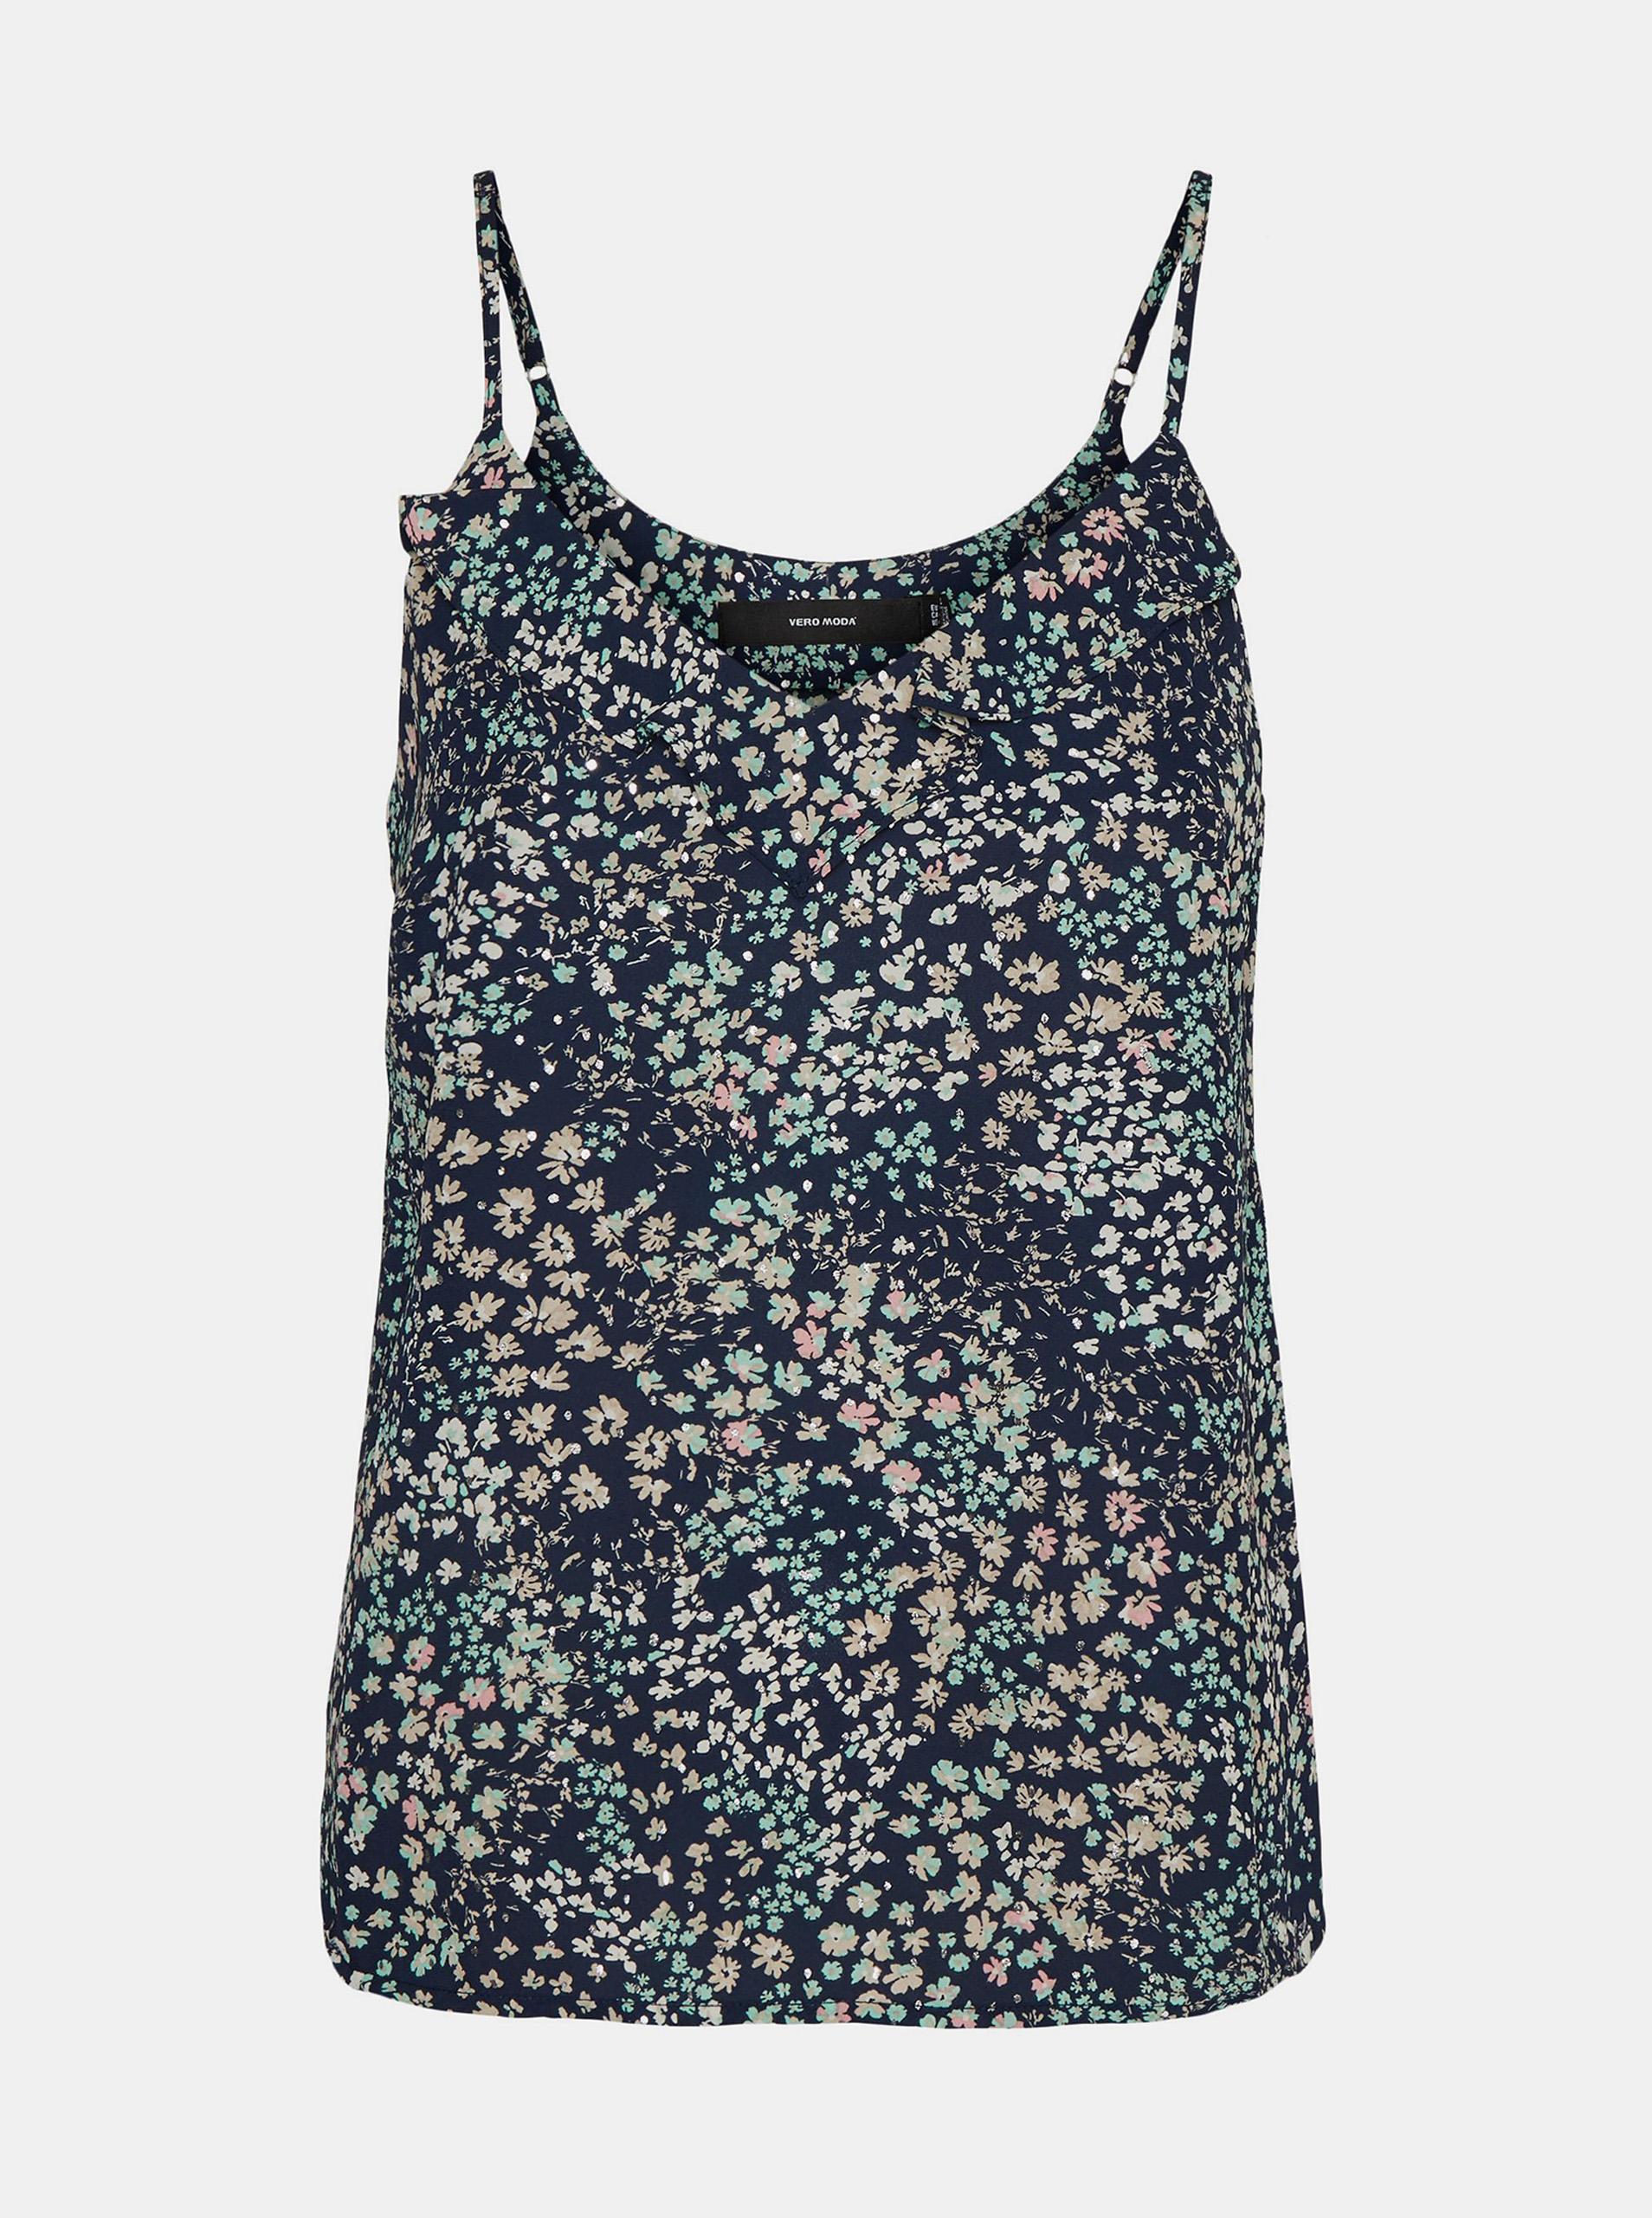 Vero Moda blue top Hannah with floral motif